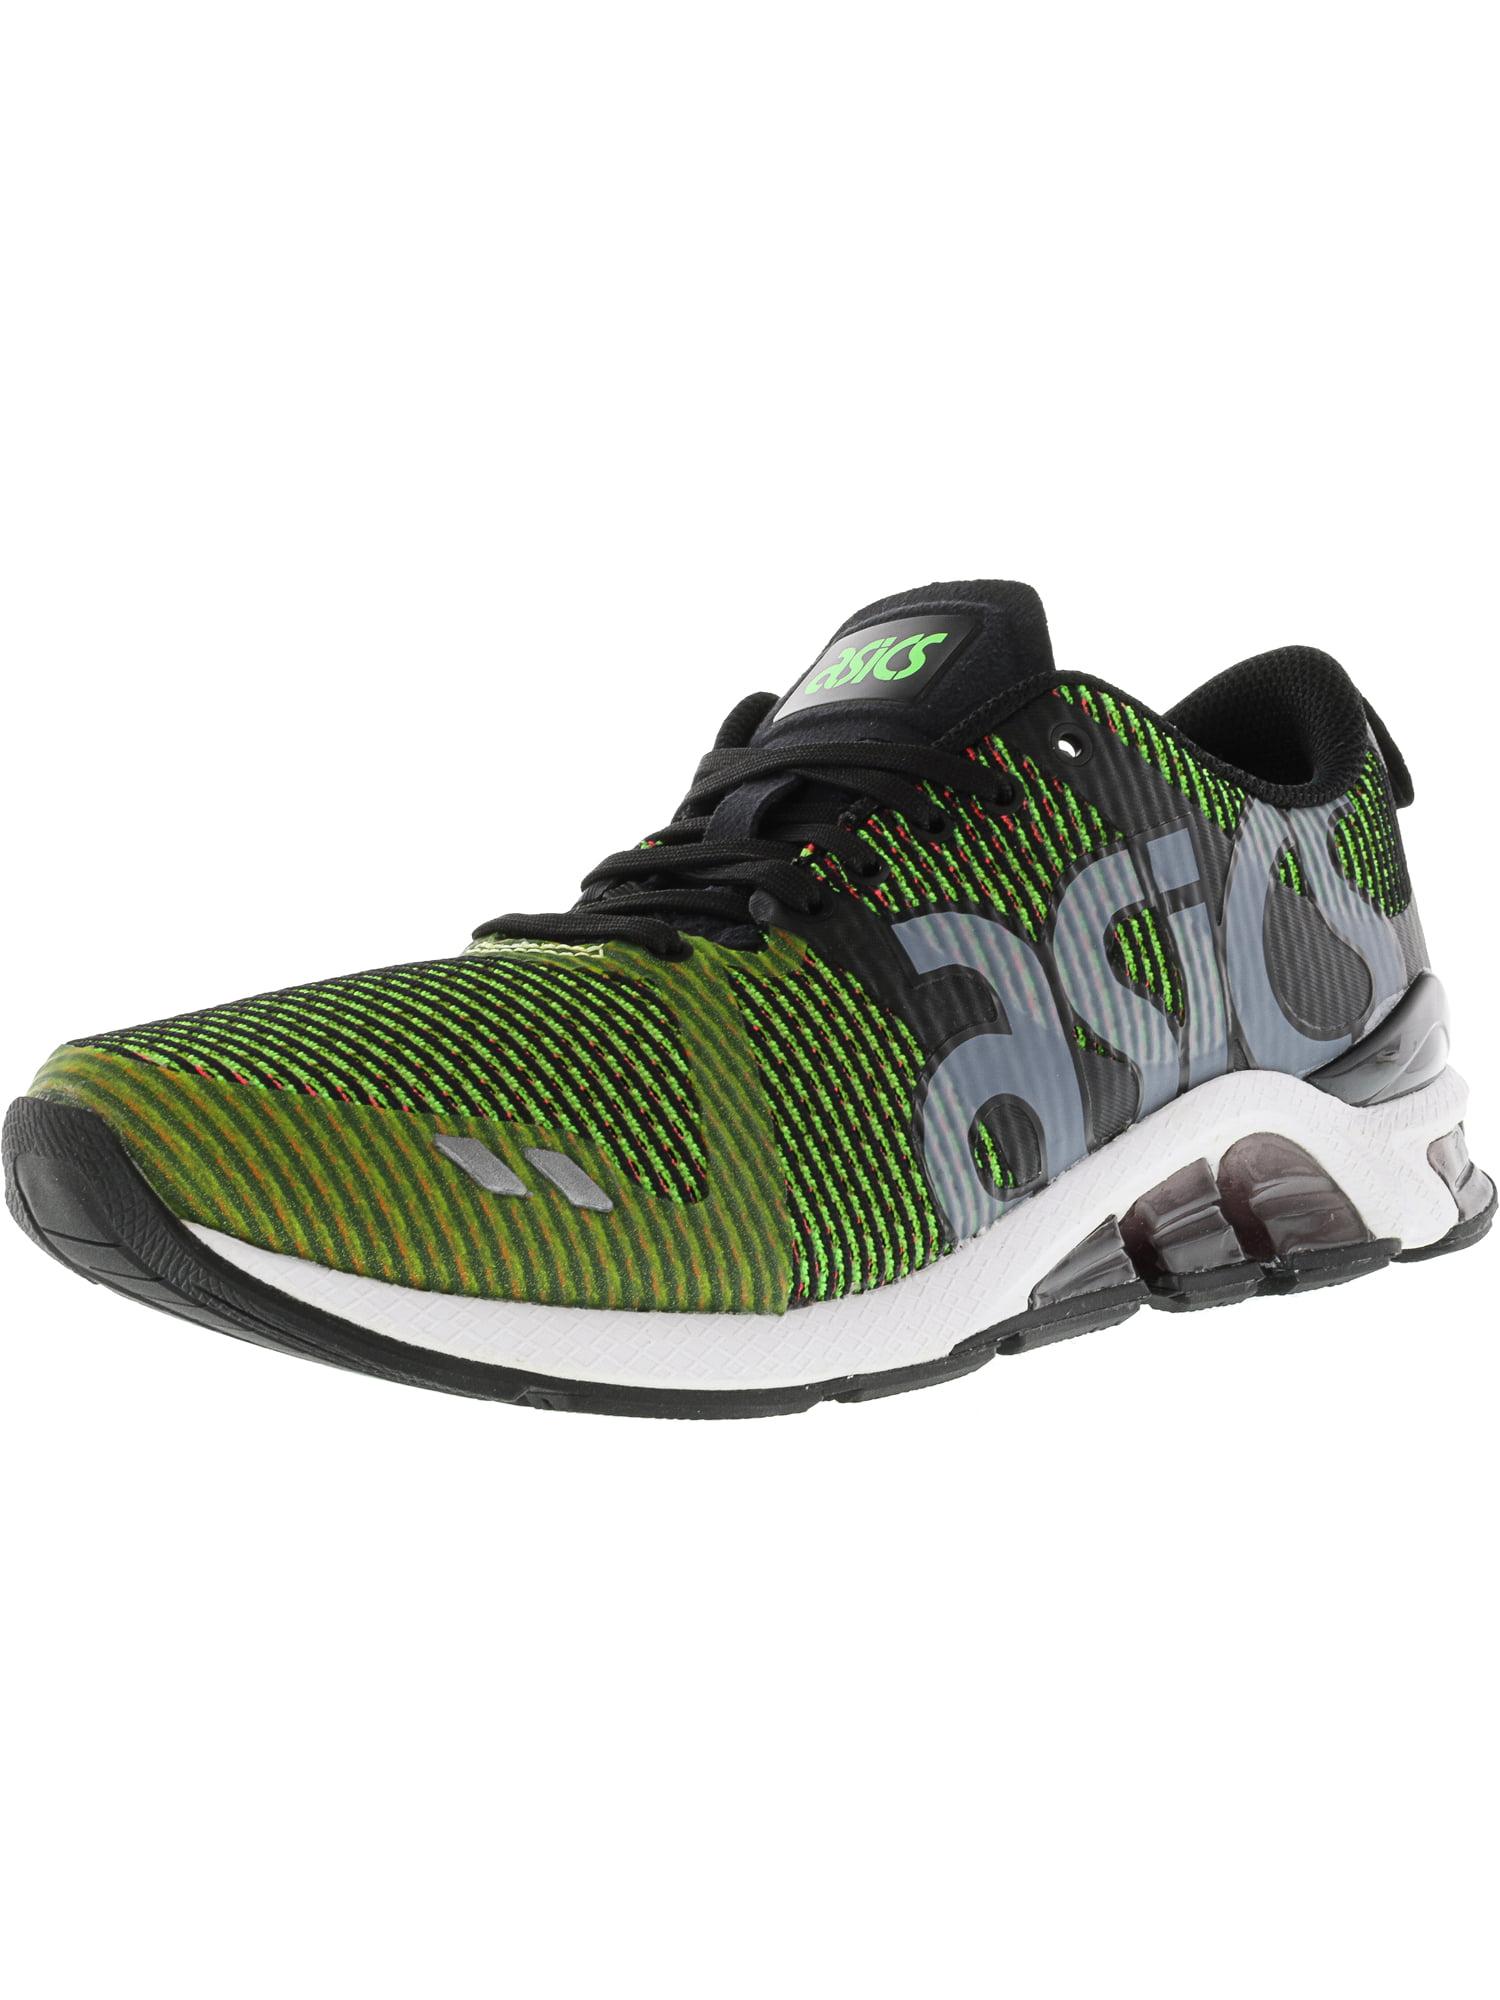 Asics Men's Gel-Lyte One Eighty Soft Grey/White Ankle-High Running Shoe - 13M